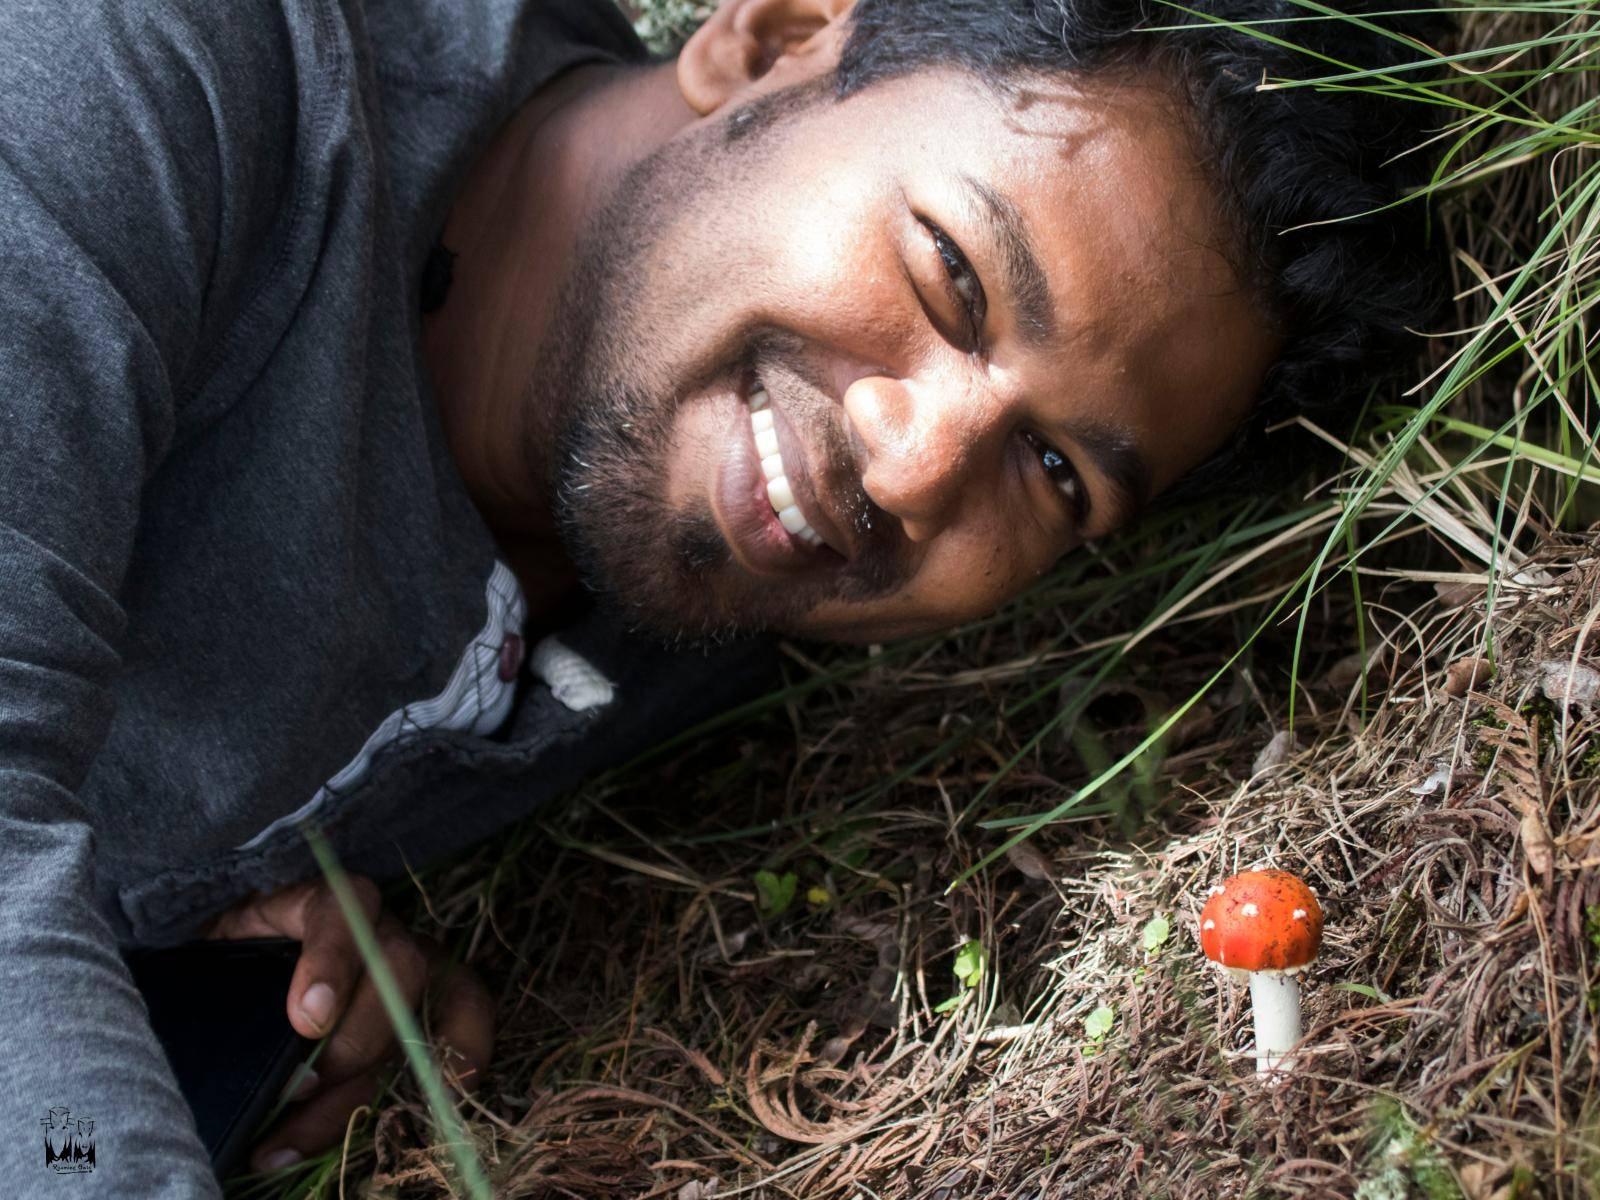 Red Mushroom,Magic Mushroom,Kodaikanal Mushroom,Dolphin Nose,Vinod Sadhasivan